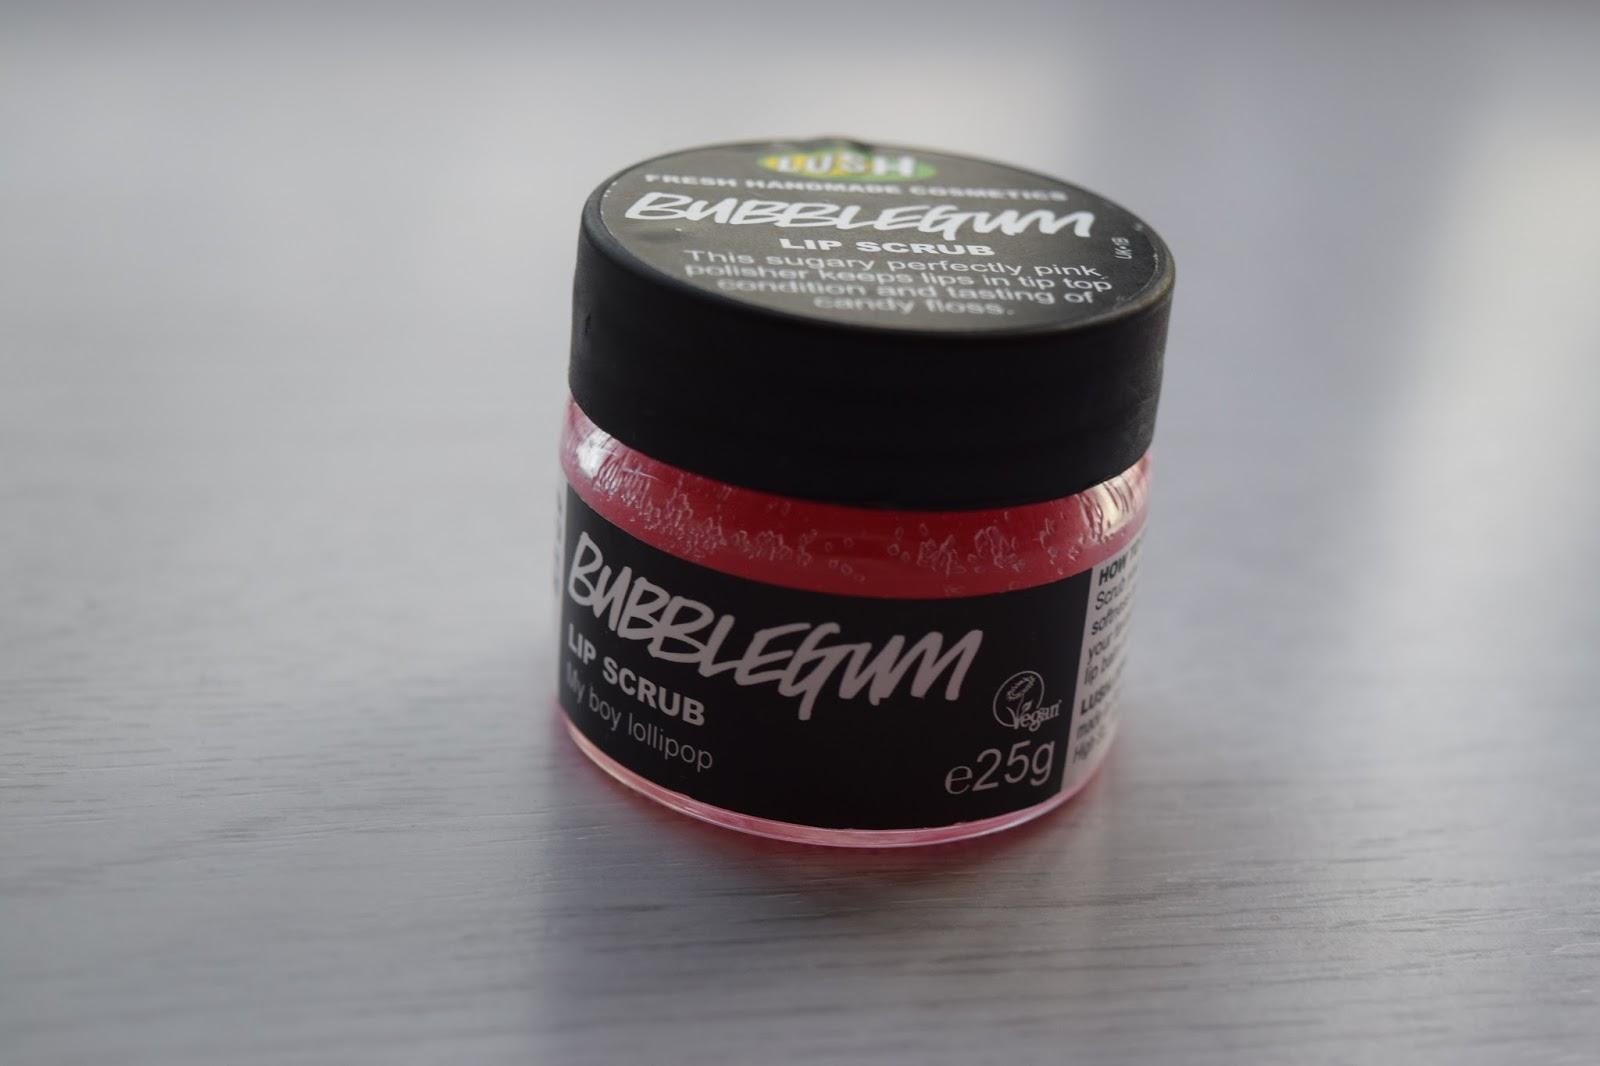 Bubblegum Lush lip scrub